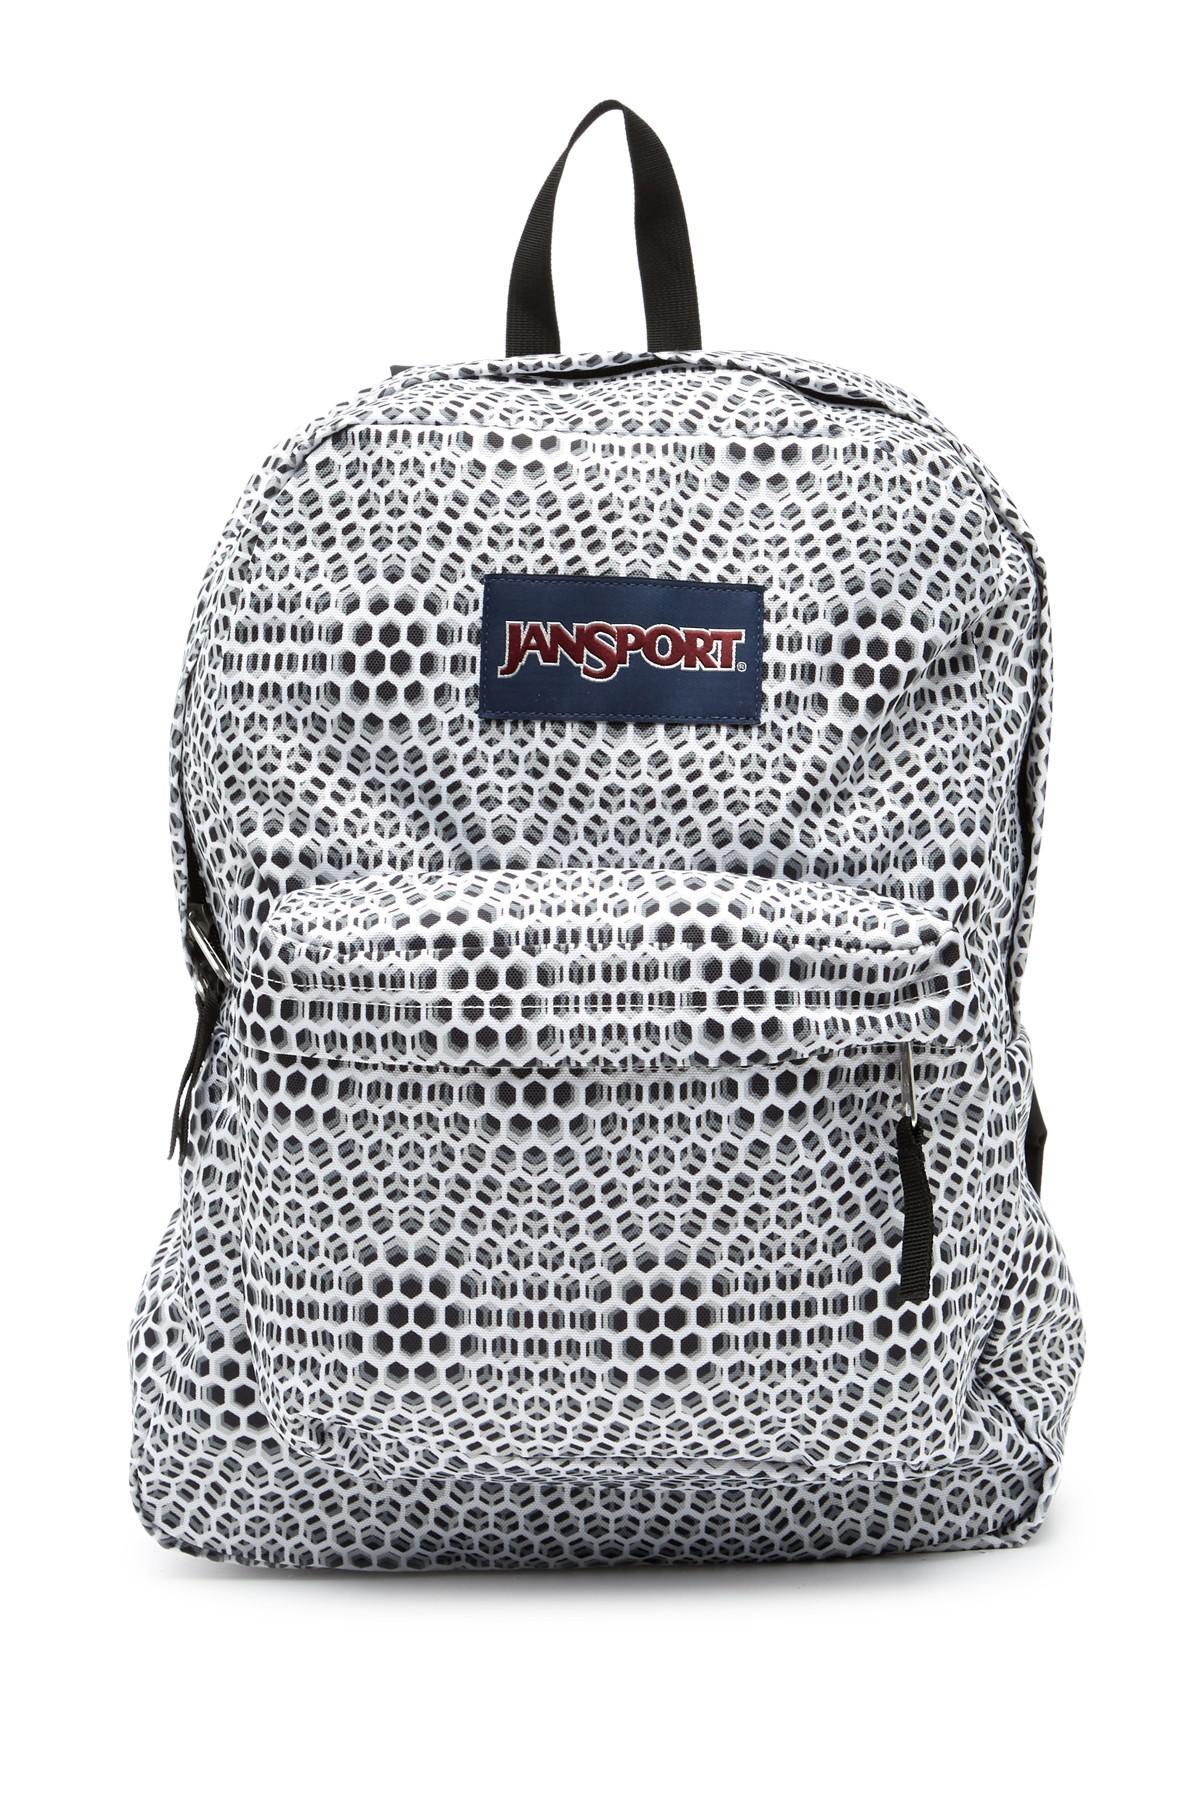 413bc62daef Jansport Superbreak Backpack Pineapple